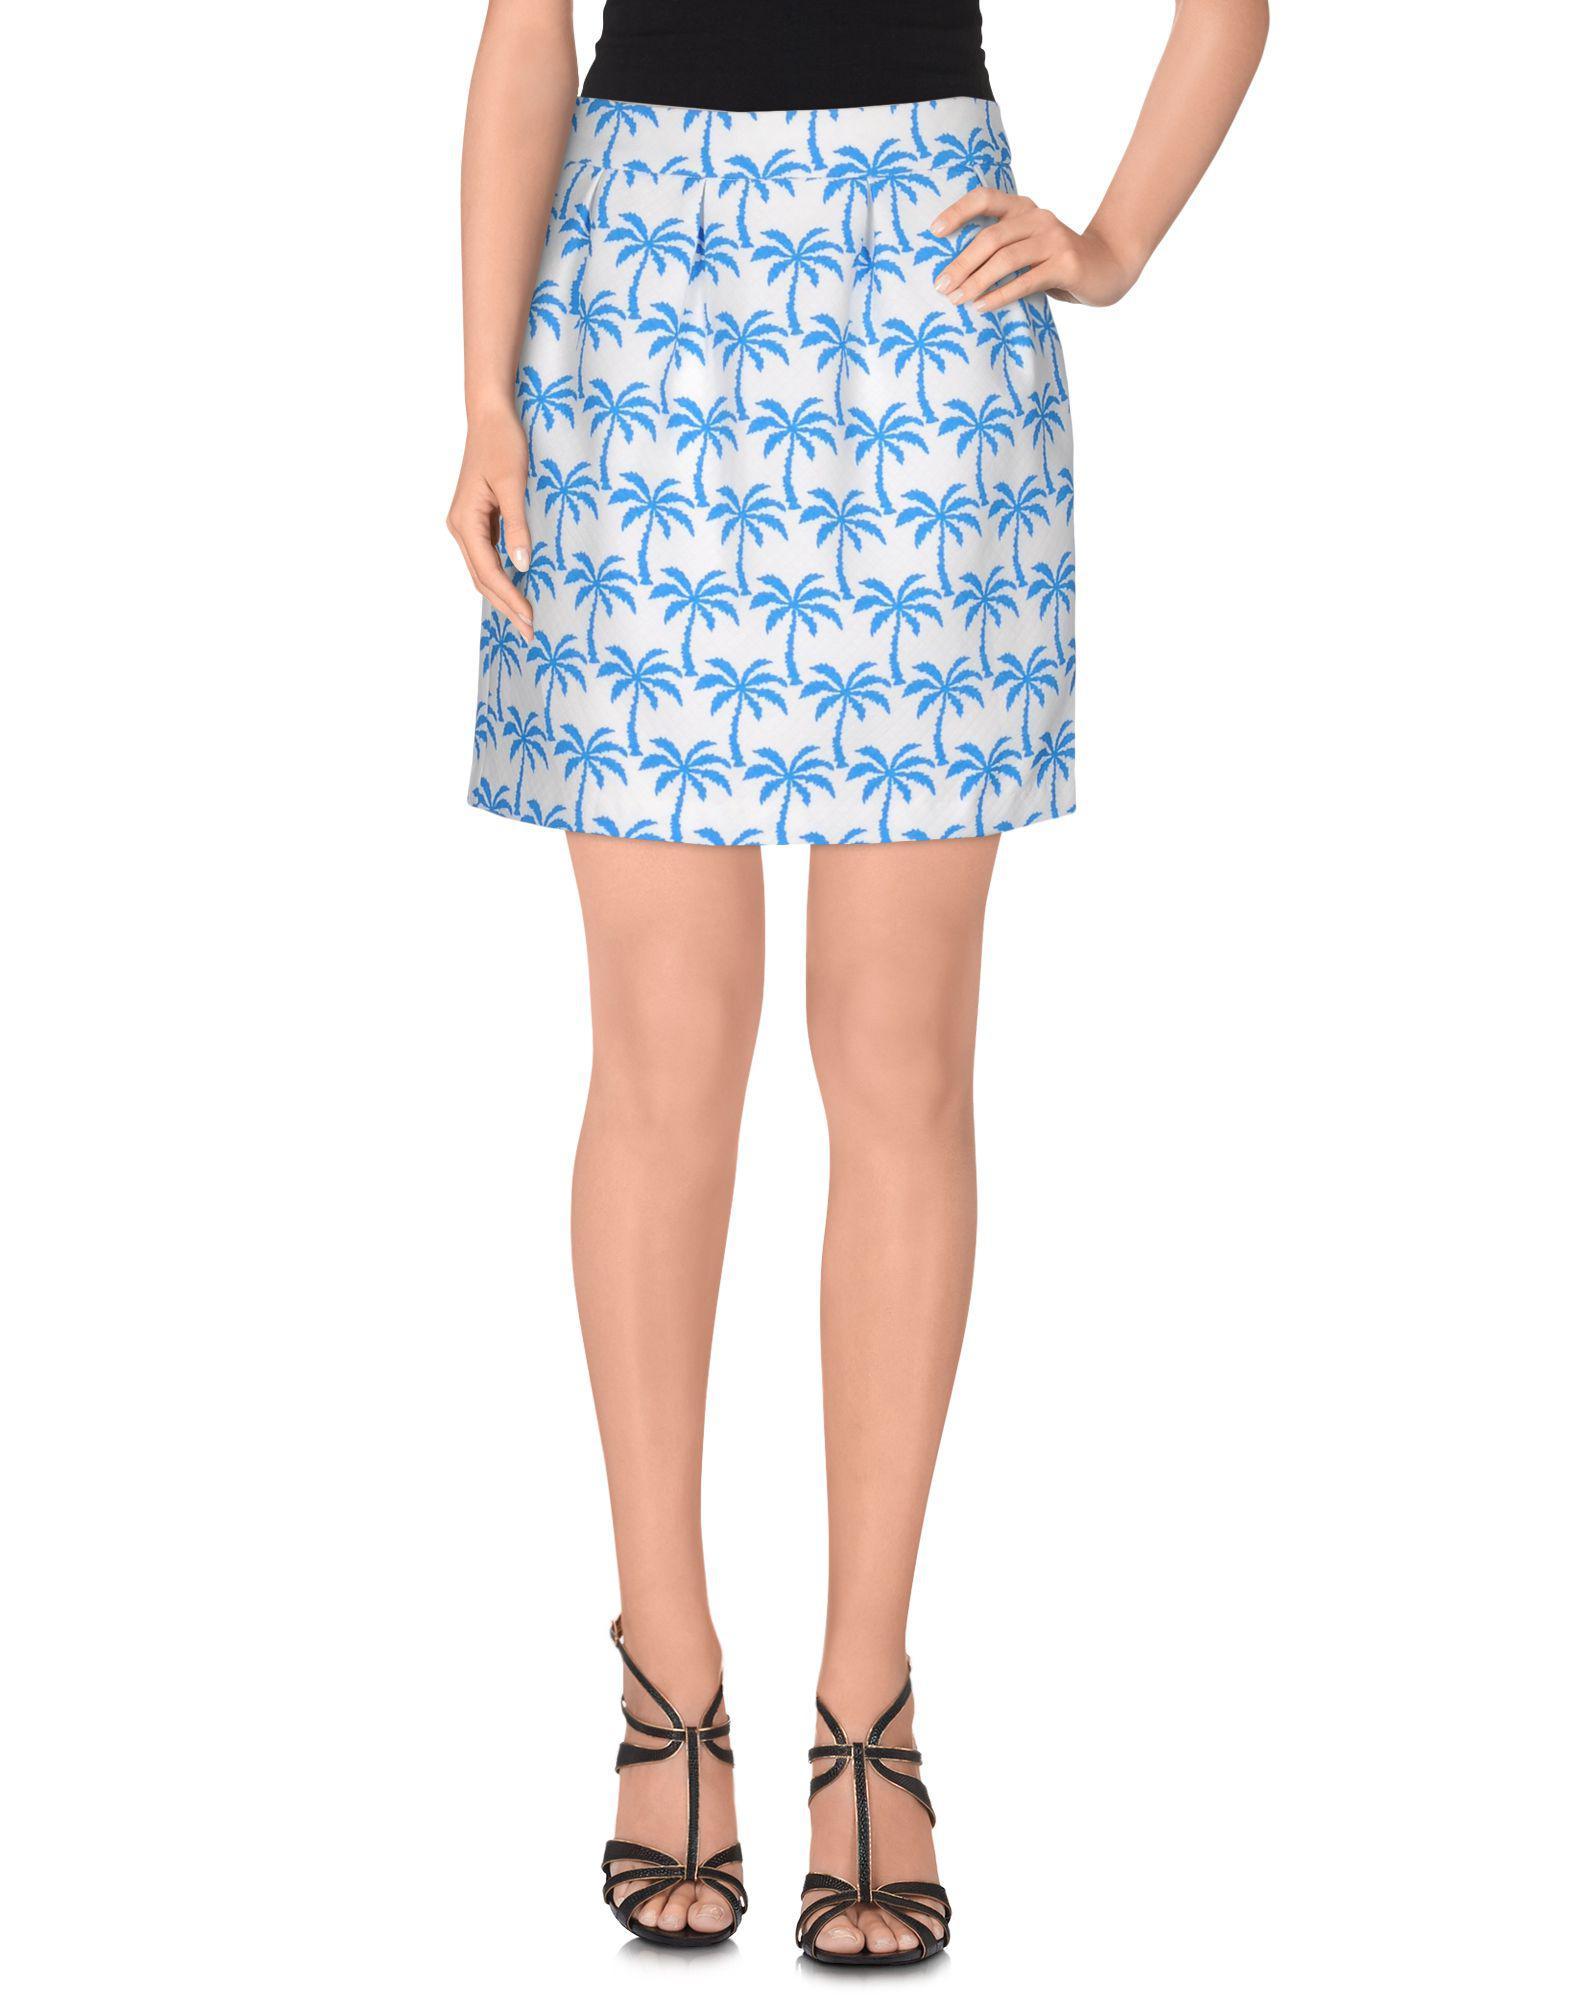 SKIRTS - Mini skirts Suncoo Cheap Sale Low Shipping Fee IK8dcN5LA